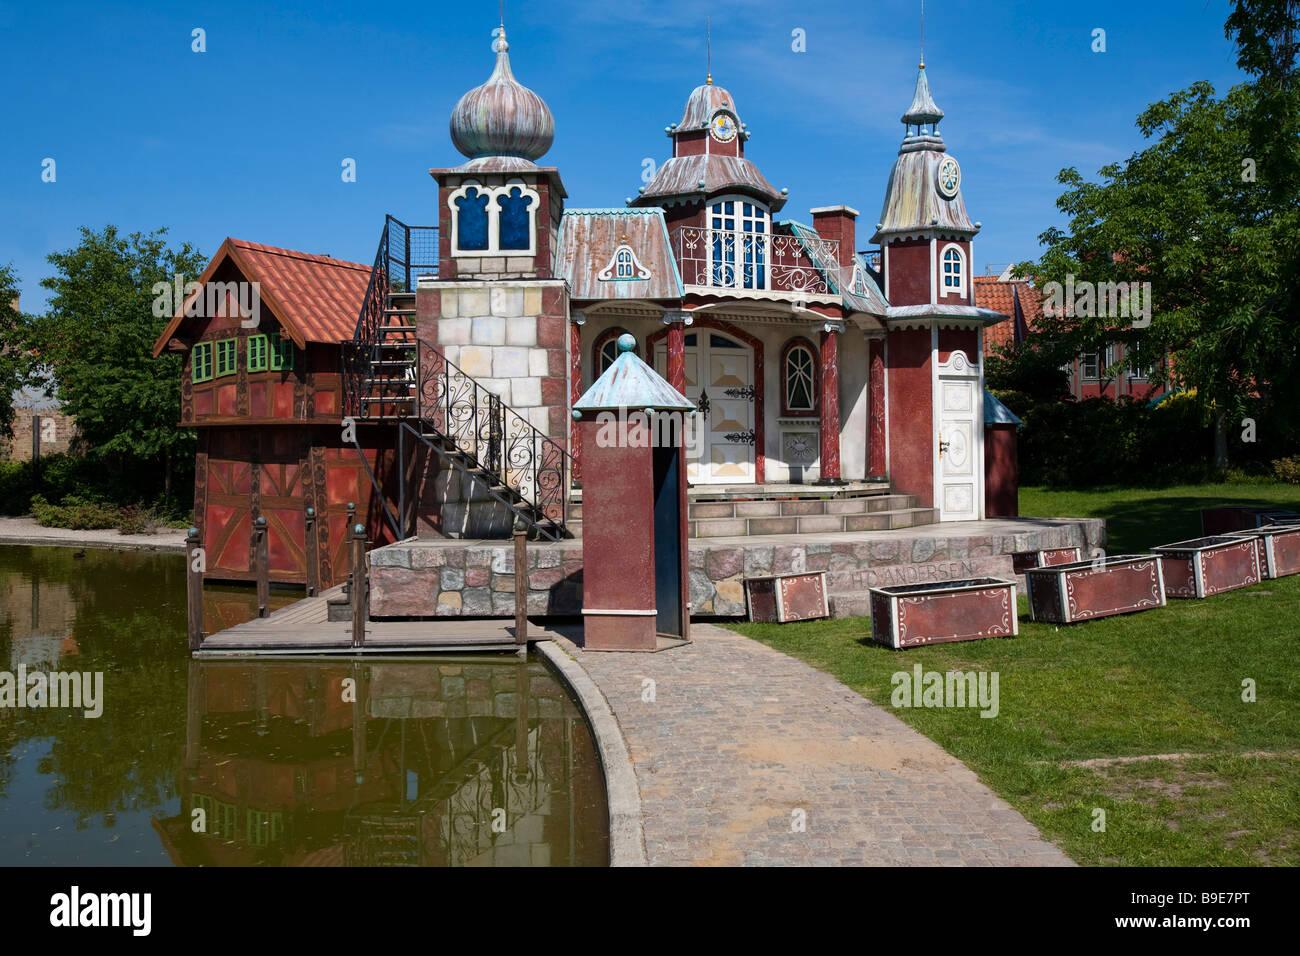 Denmark Odense H C Andersen Hus museum theatre Stock Photo, Royalty Free Image: 23055728 - Alamy